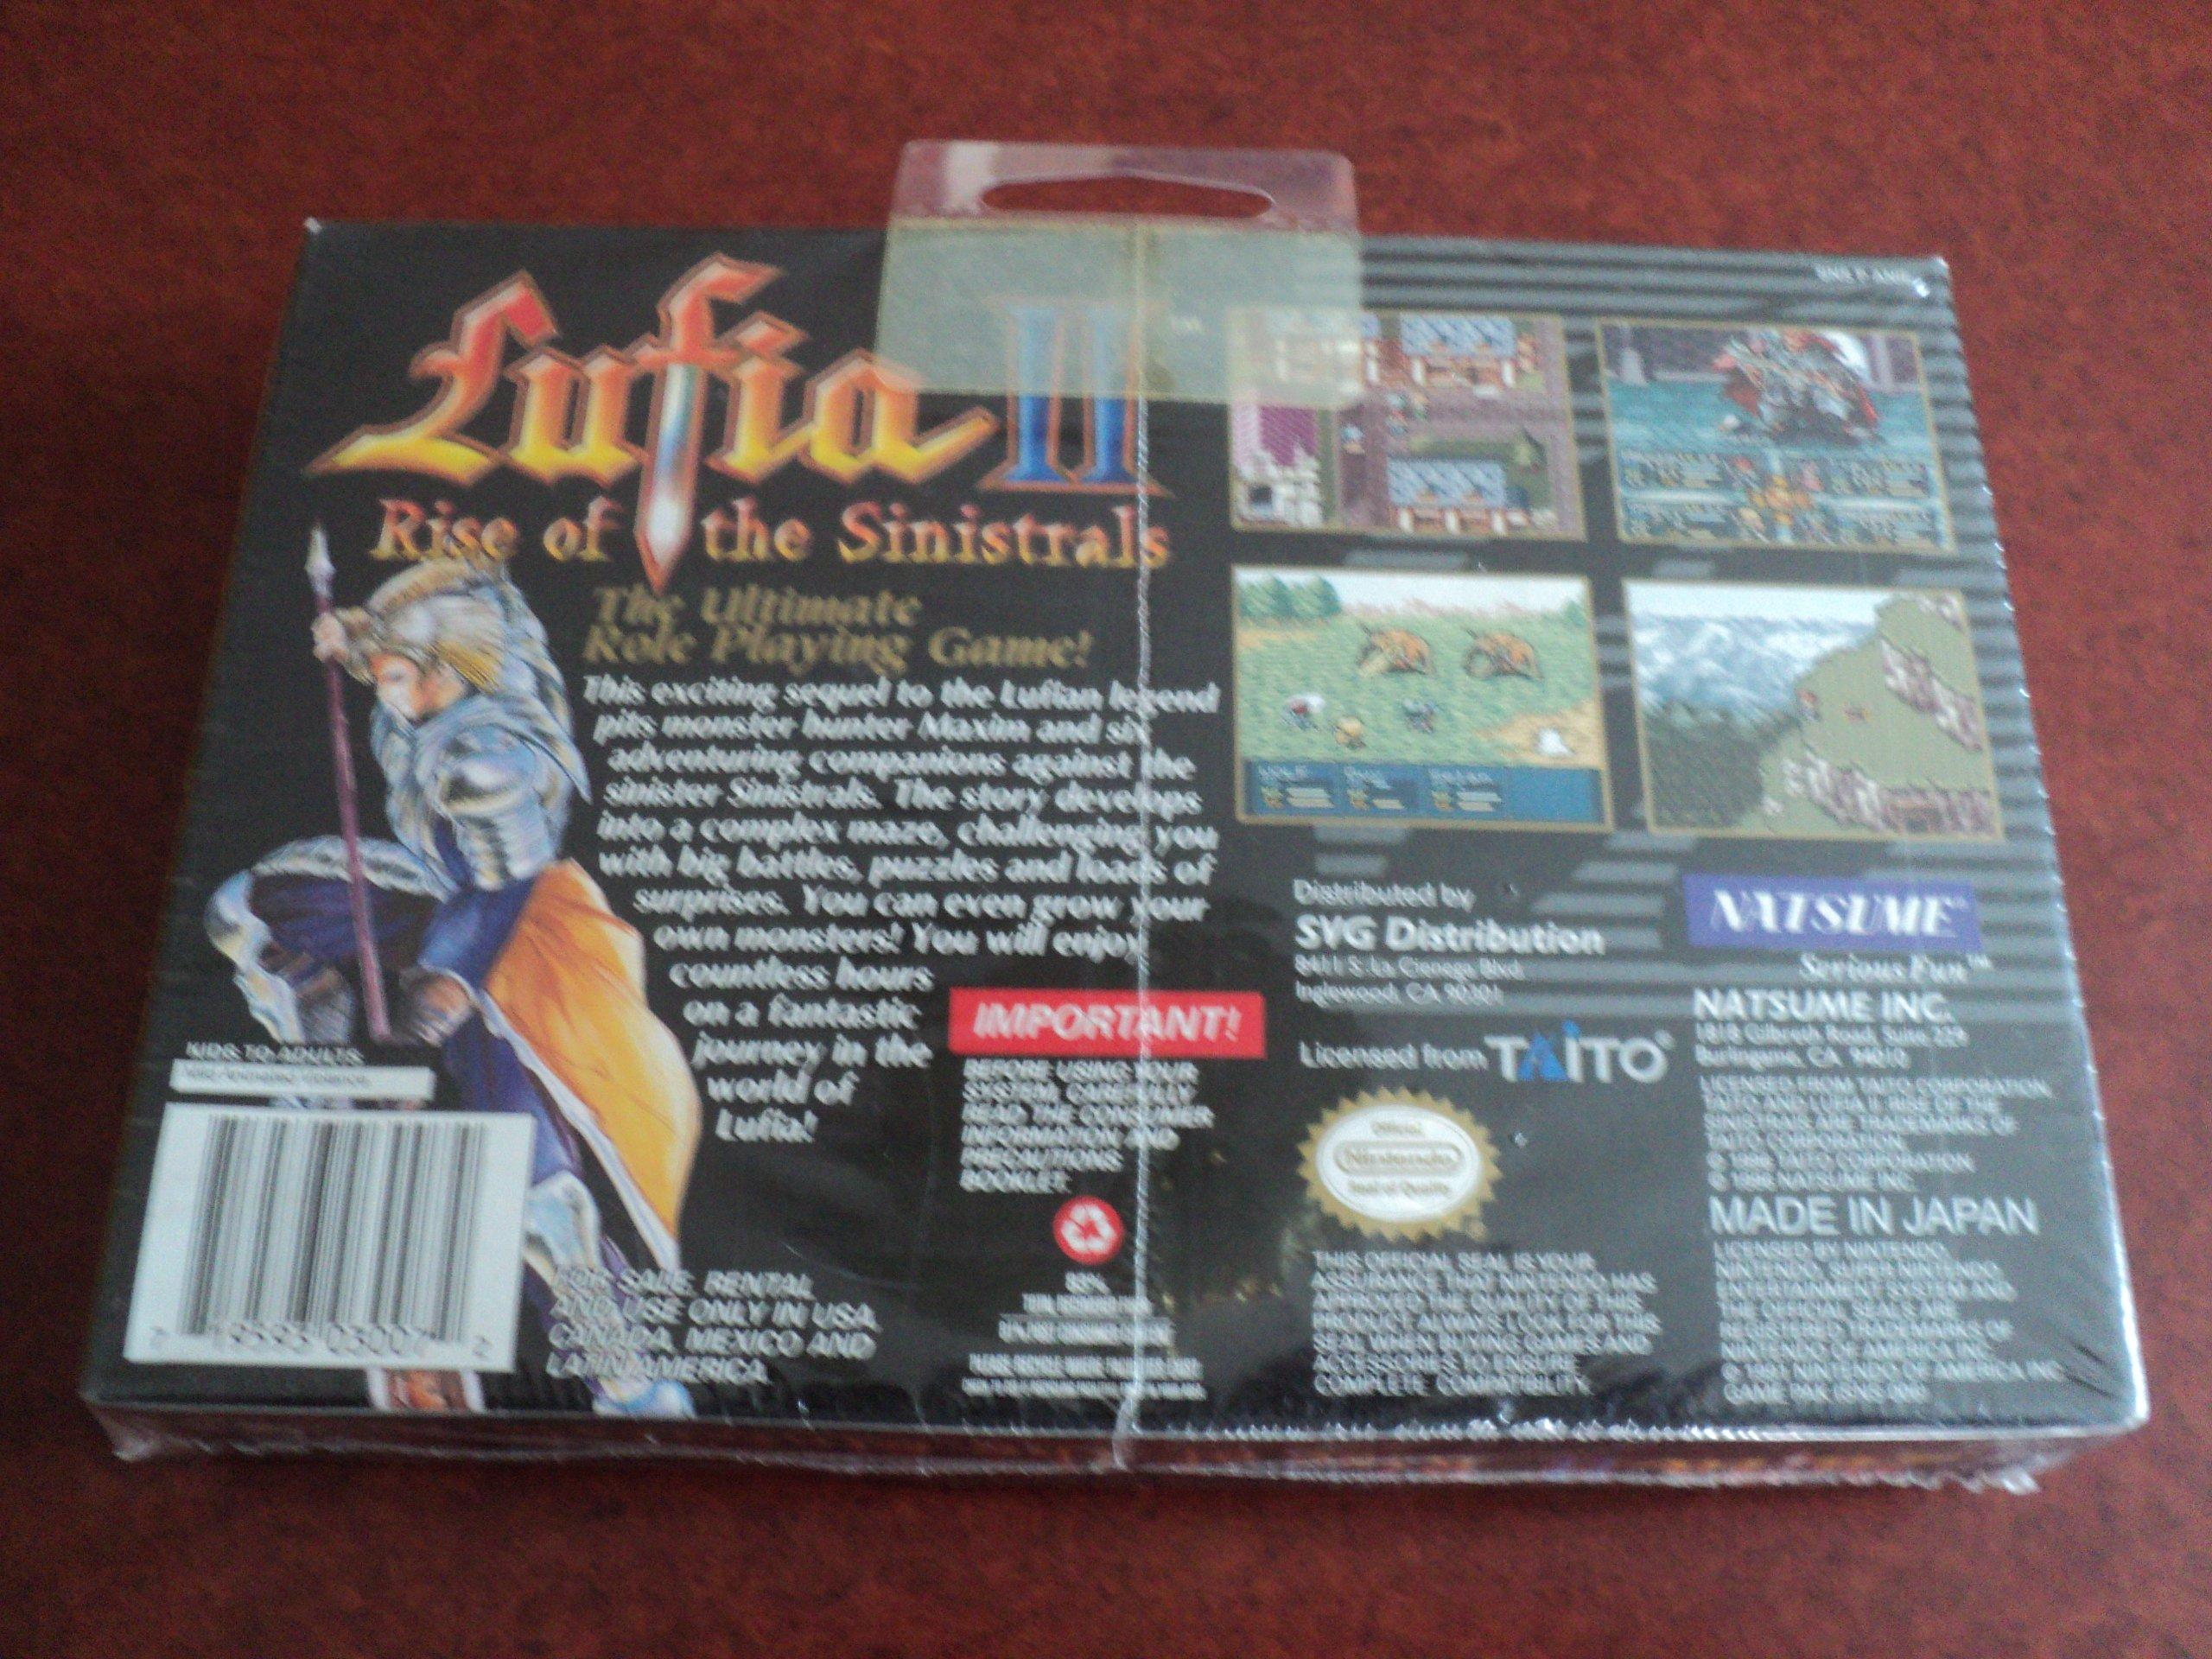 Amazon com: Lufia II: Rise of the Sinistrals: Video Games